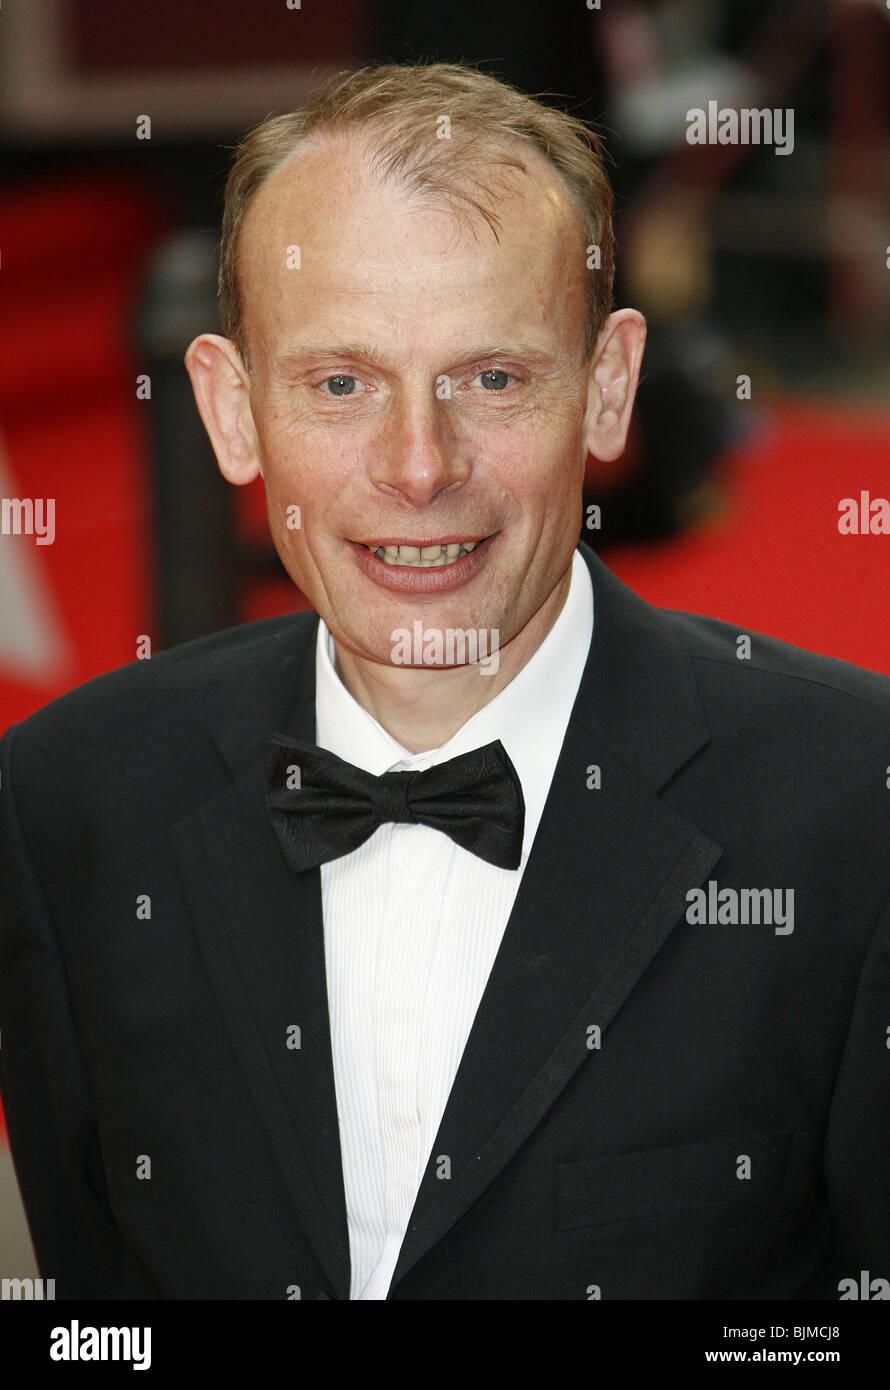 ANDREW MARR BAFTA TELEVISION AWARDS 2008 LONDON PALLADIUM ARGYLL STREET LONDON ENGLAND 20 April 2008 - Stock Image